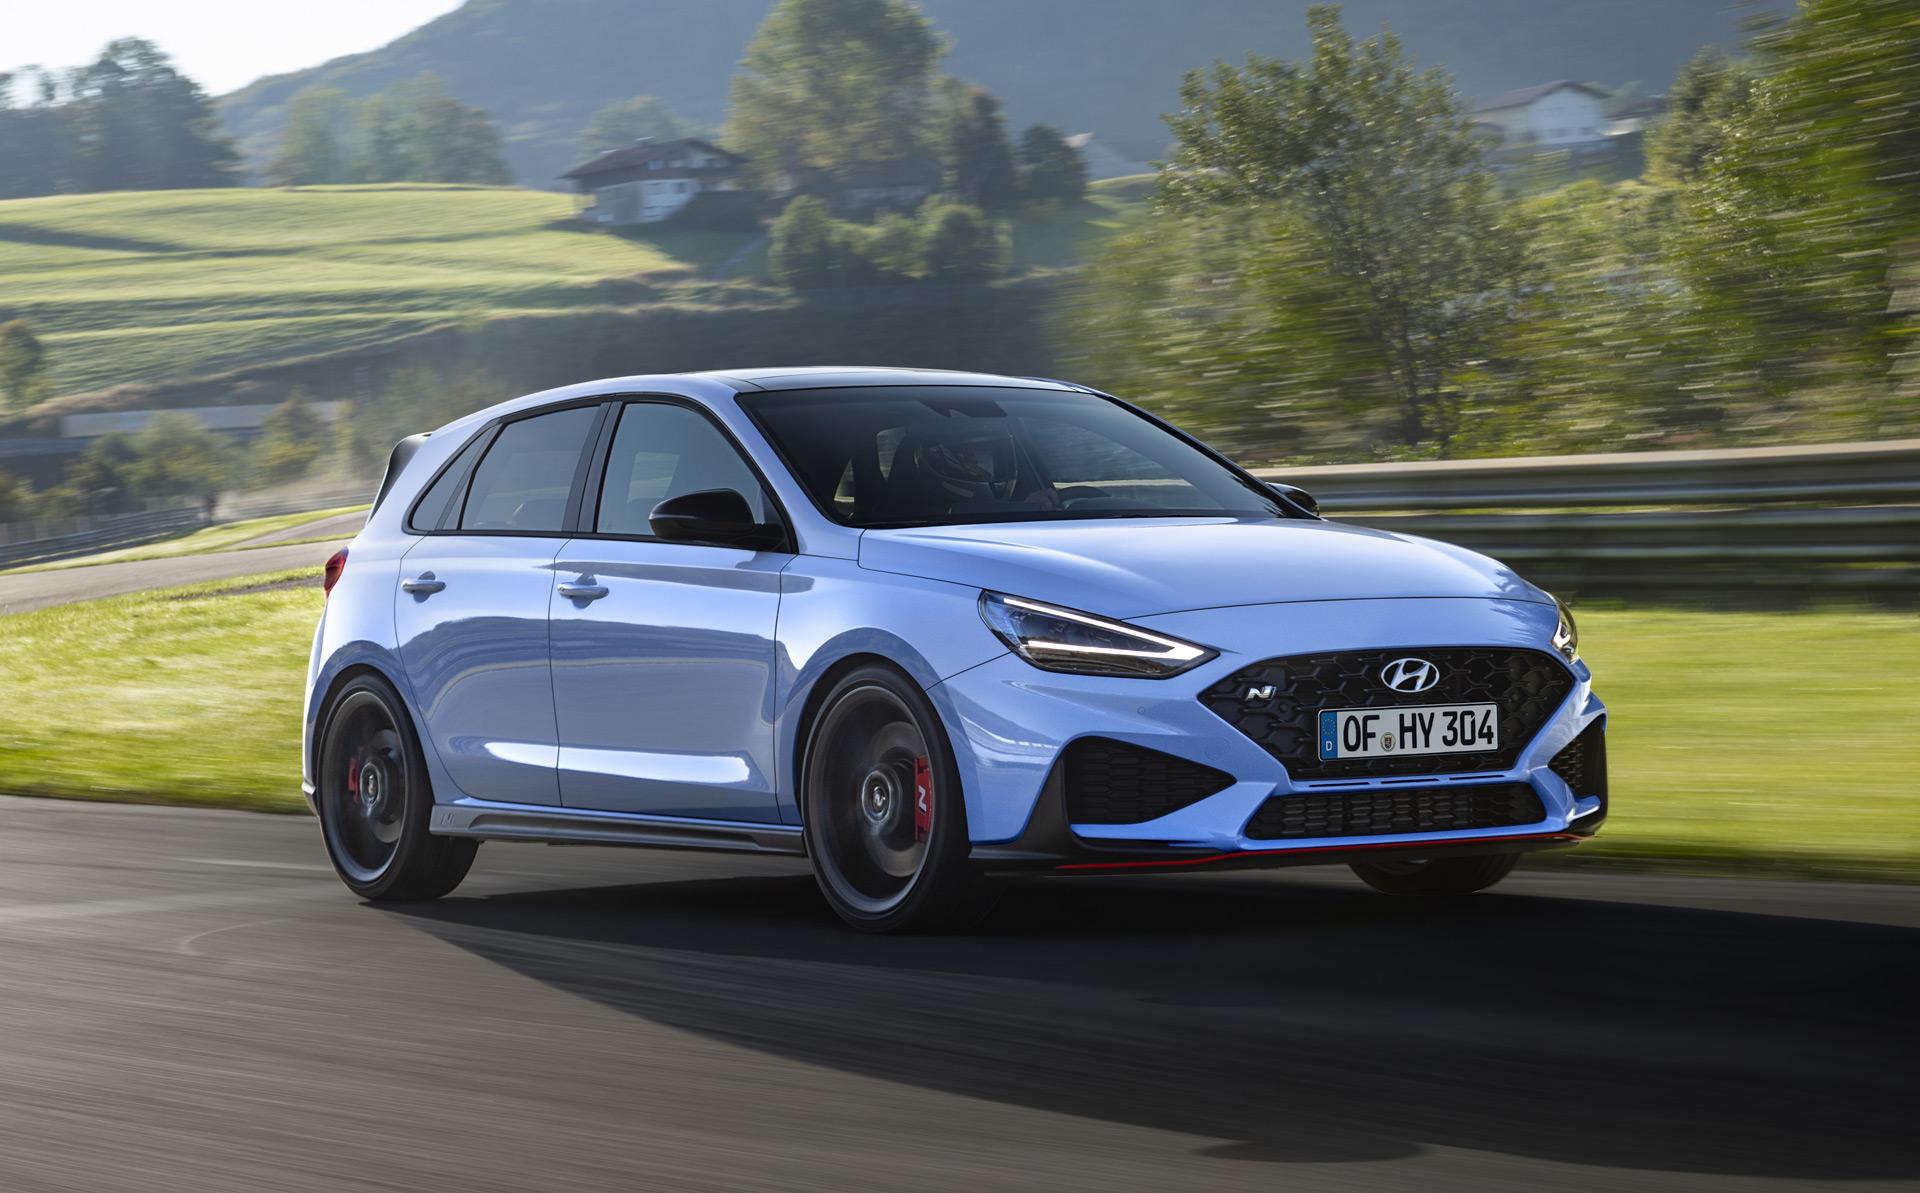 Preview: 5 Hyundai i5 N sports new look, dual-clutch transmission